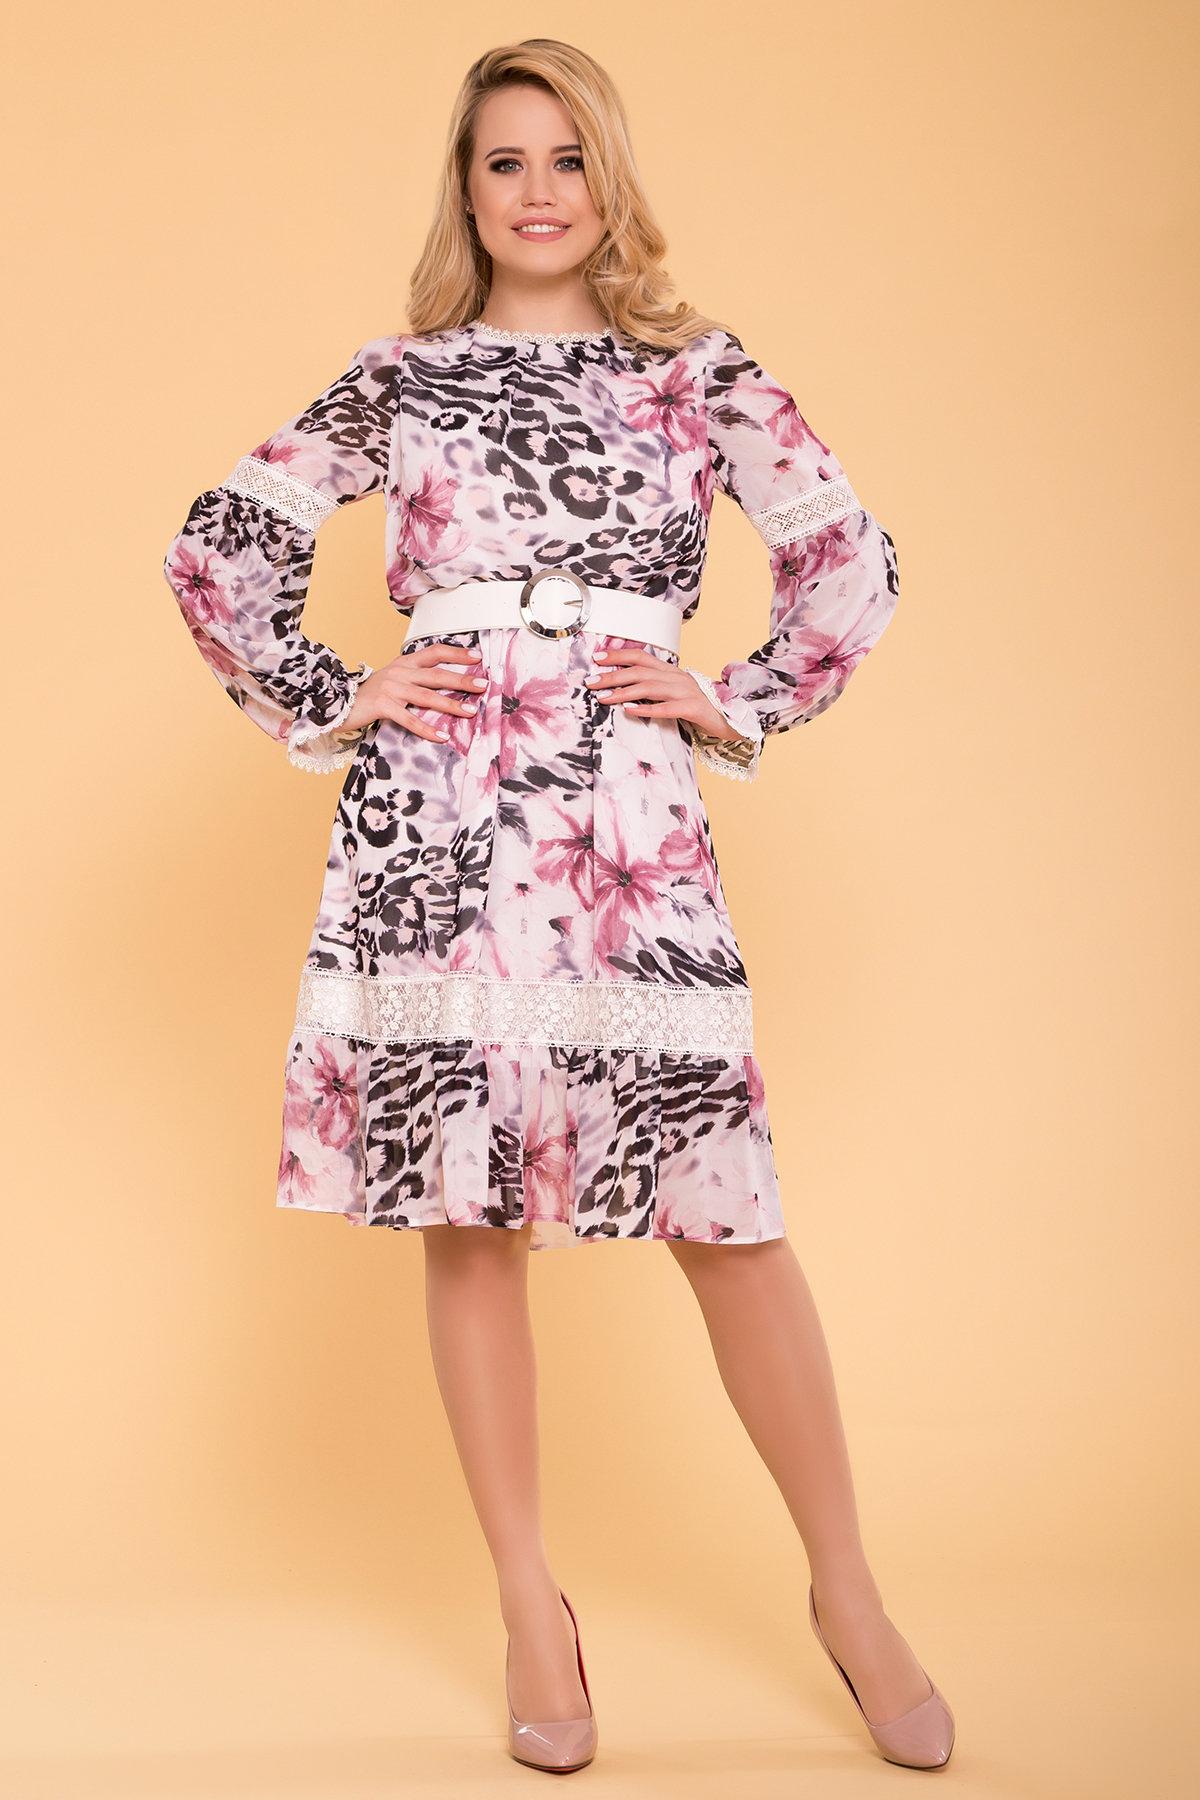 Платье Санем 6587 Цвет: Леоп цвет мол/пудр/мол